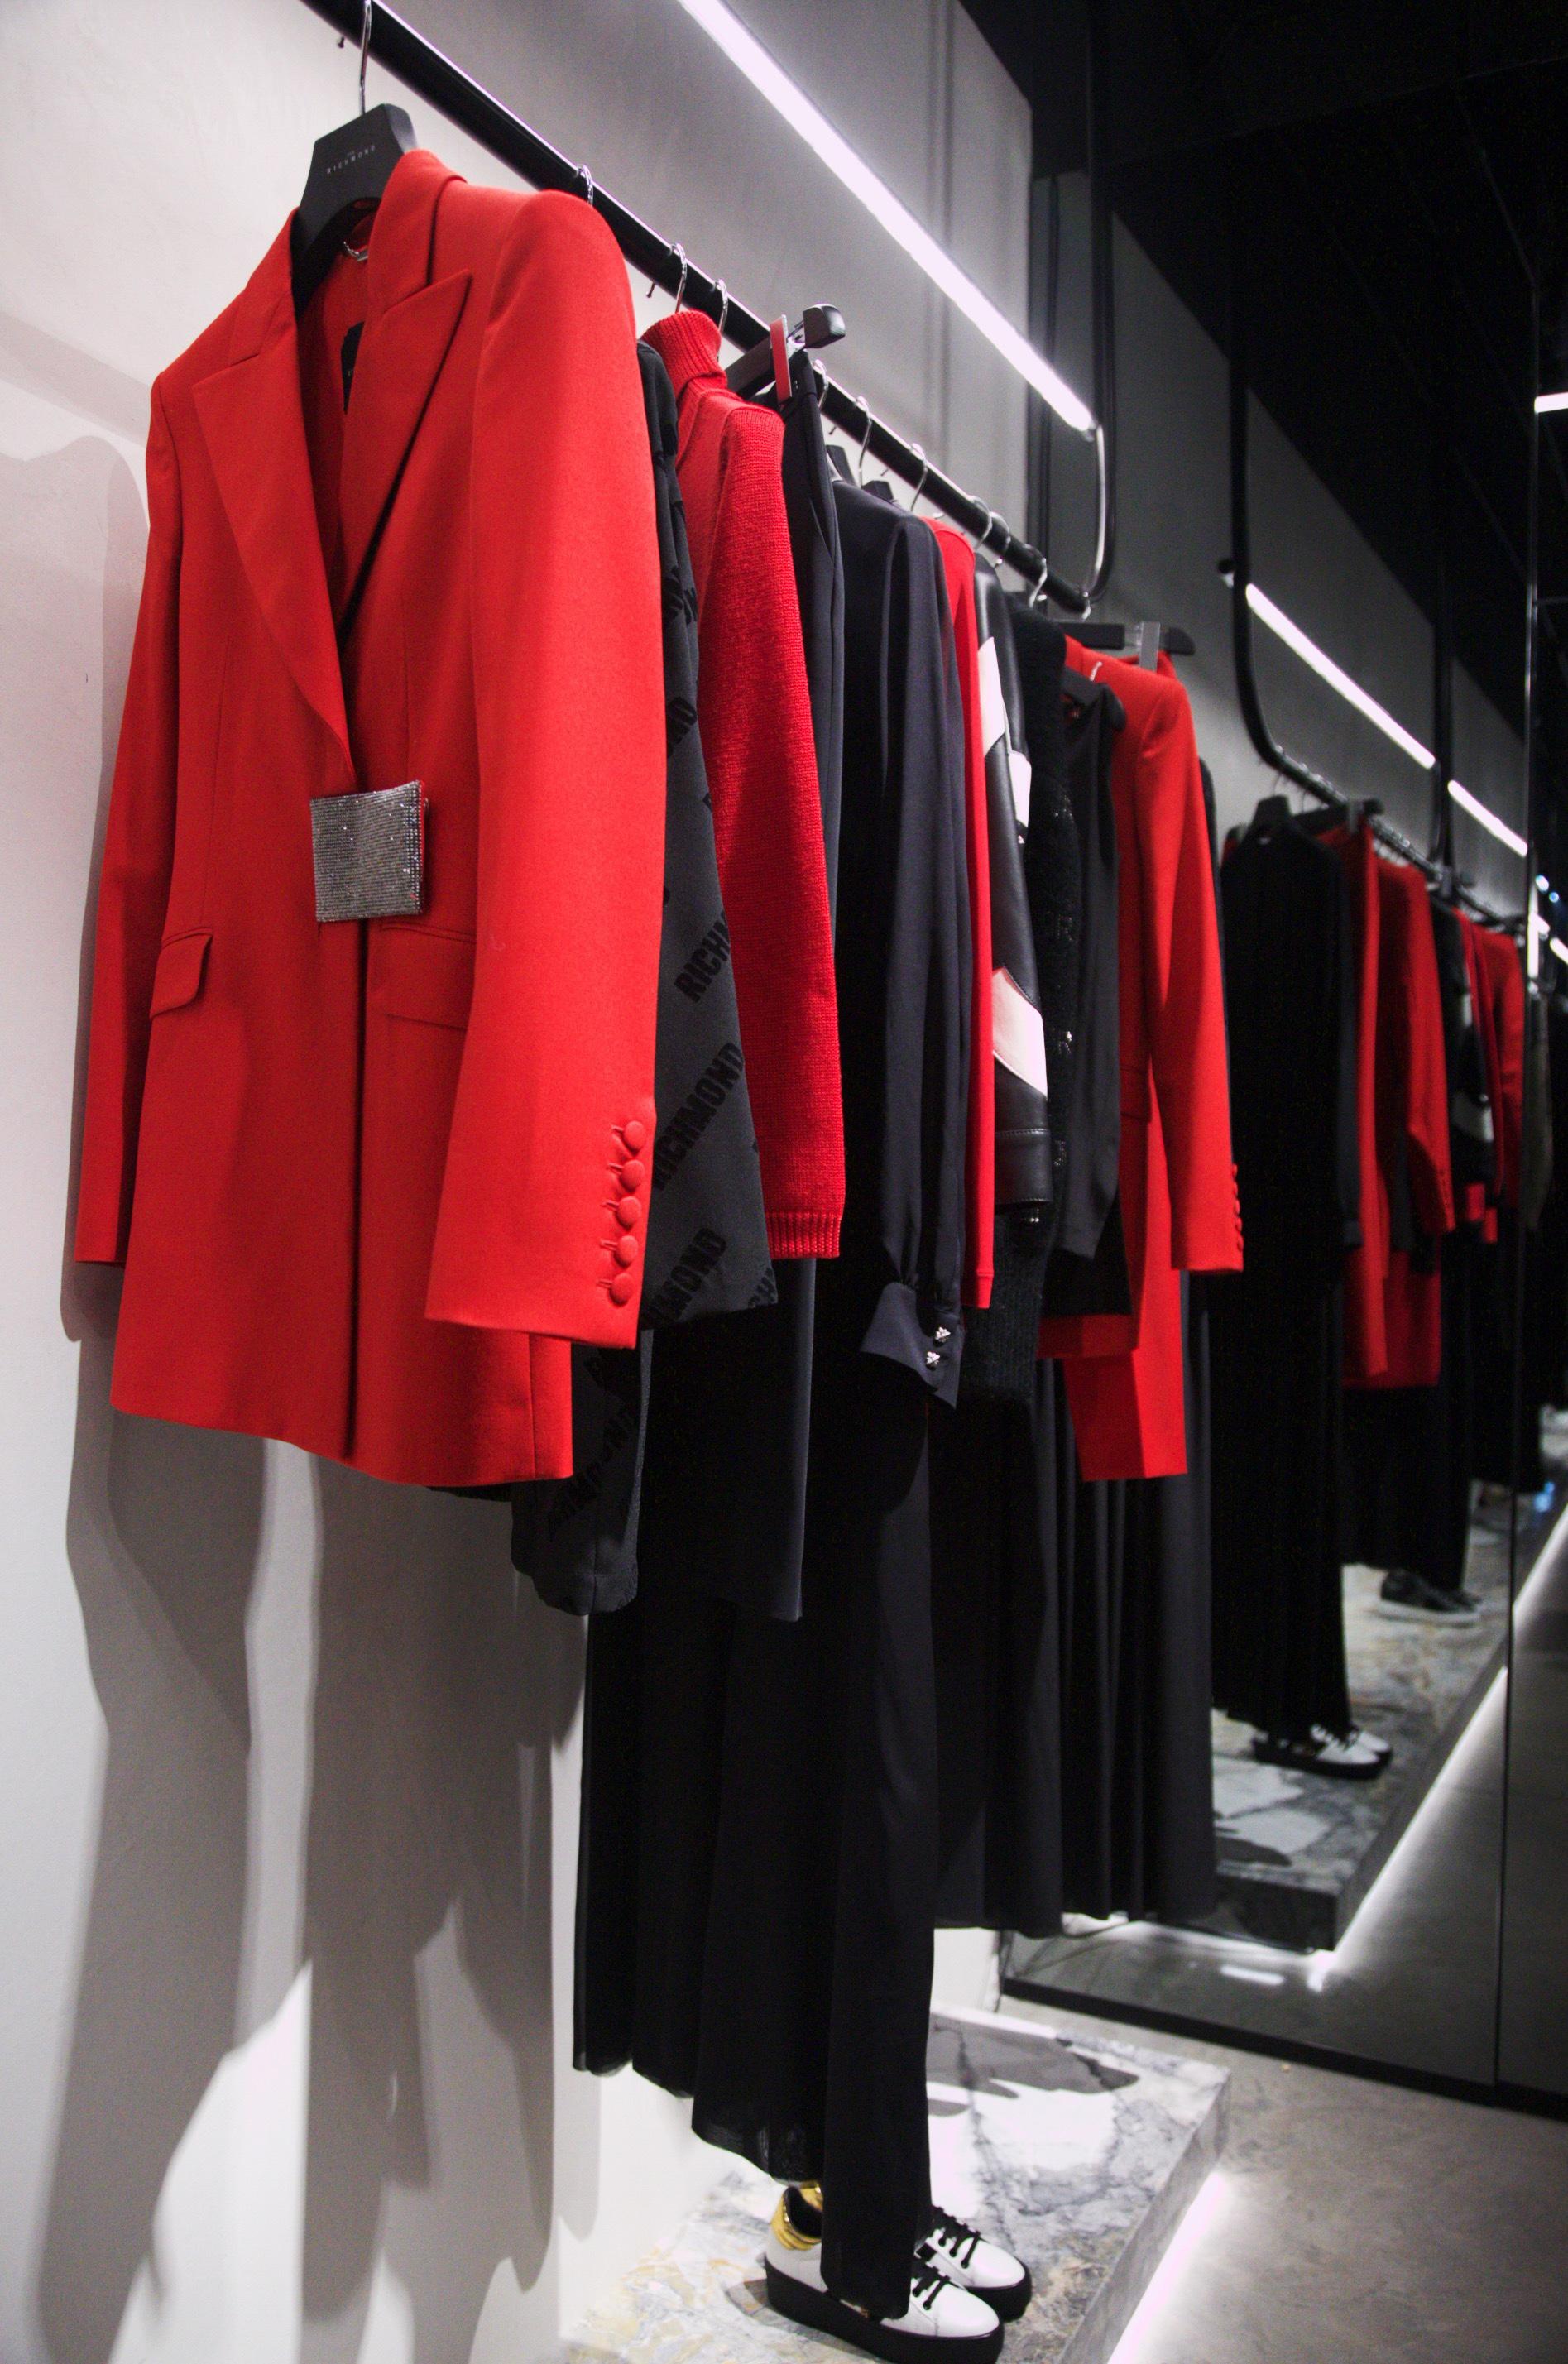 ohn Richmond, New opening boutique Milano, one more addiction, Giulia Napoli